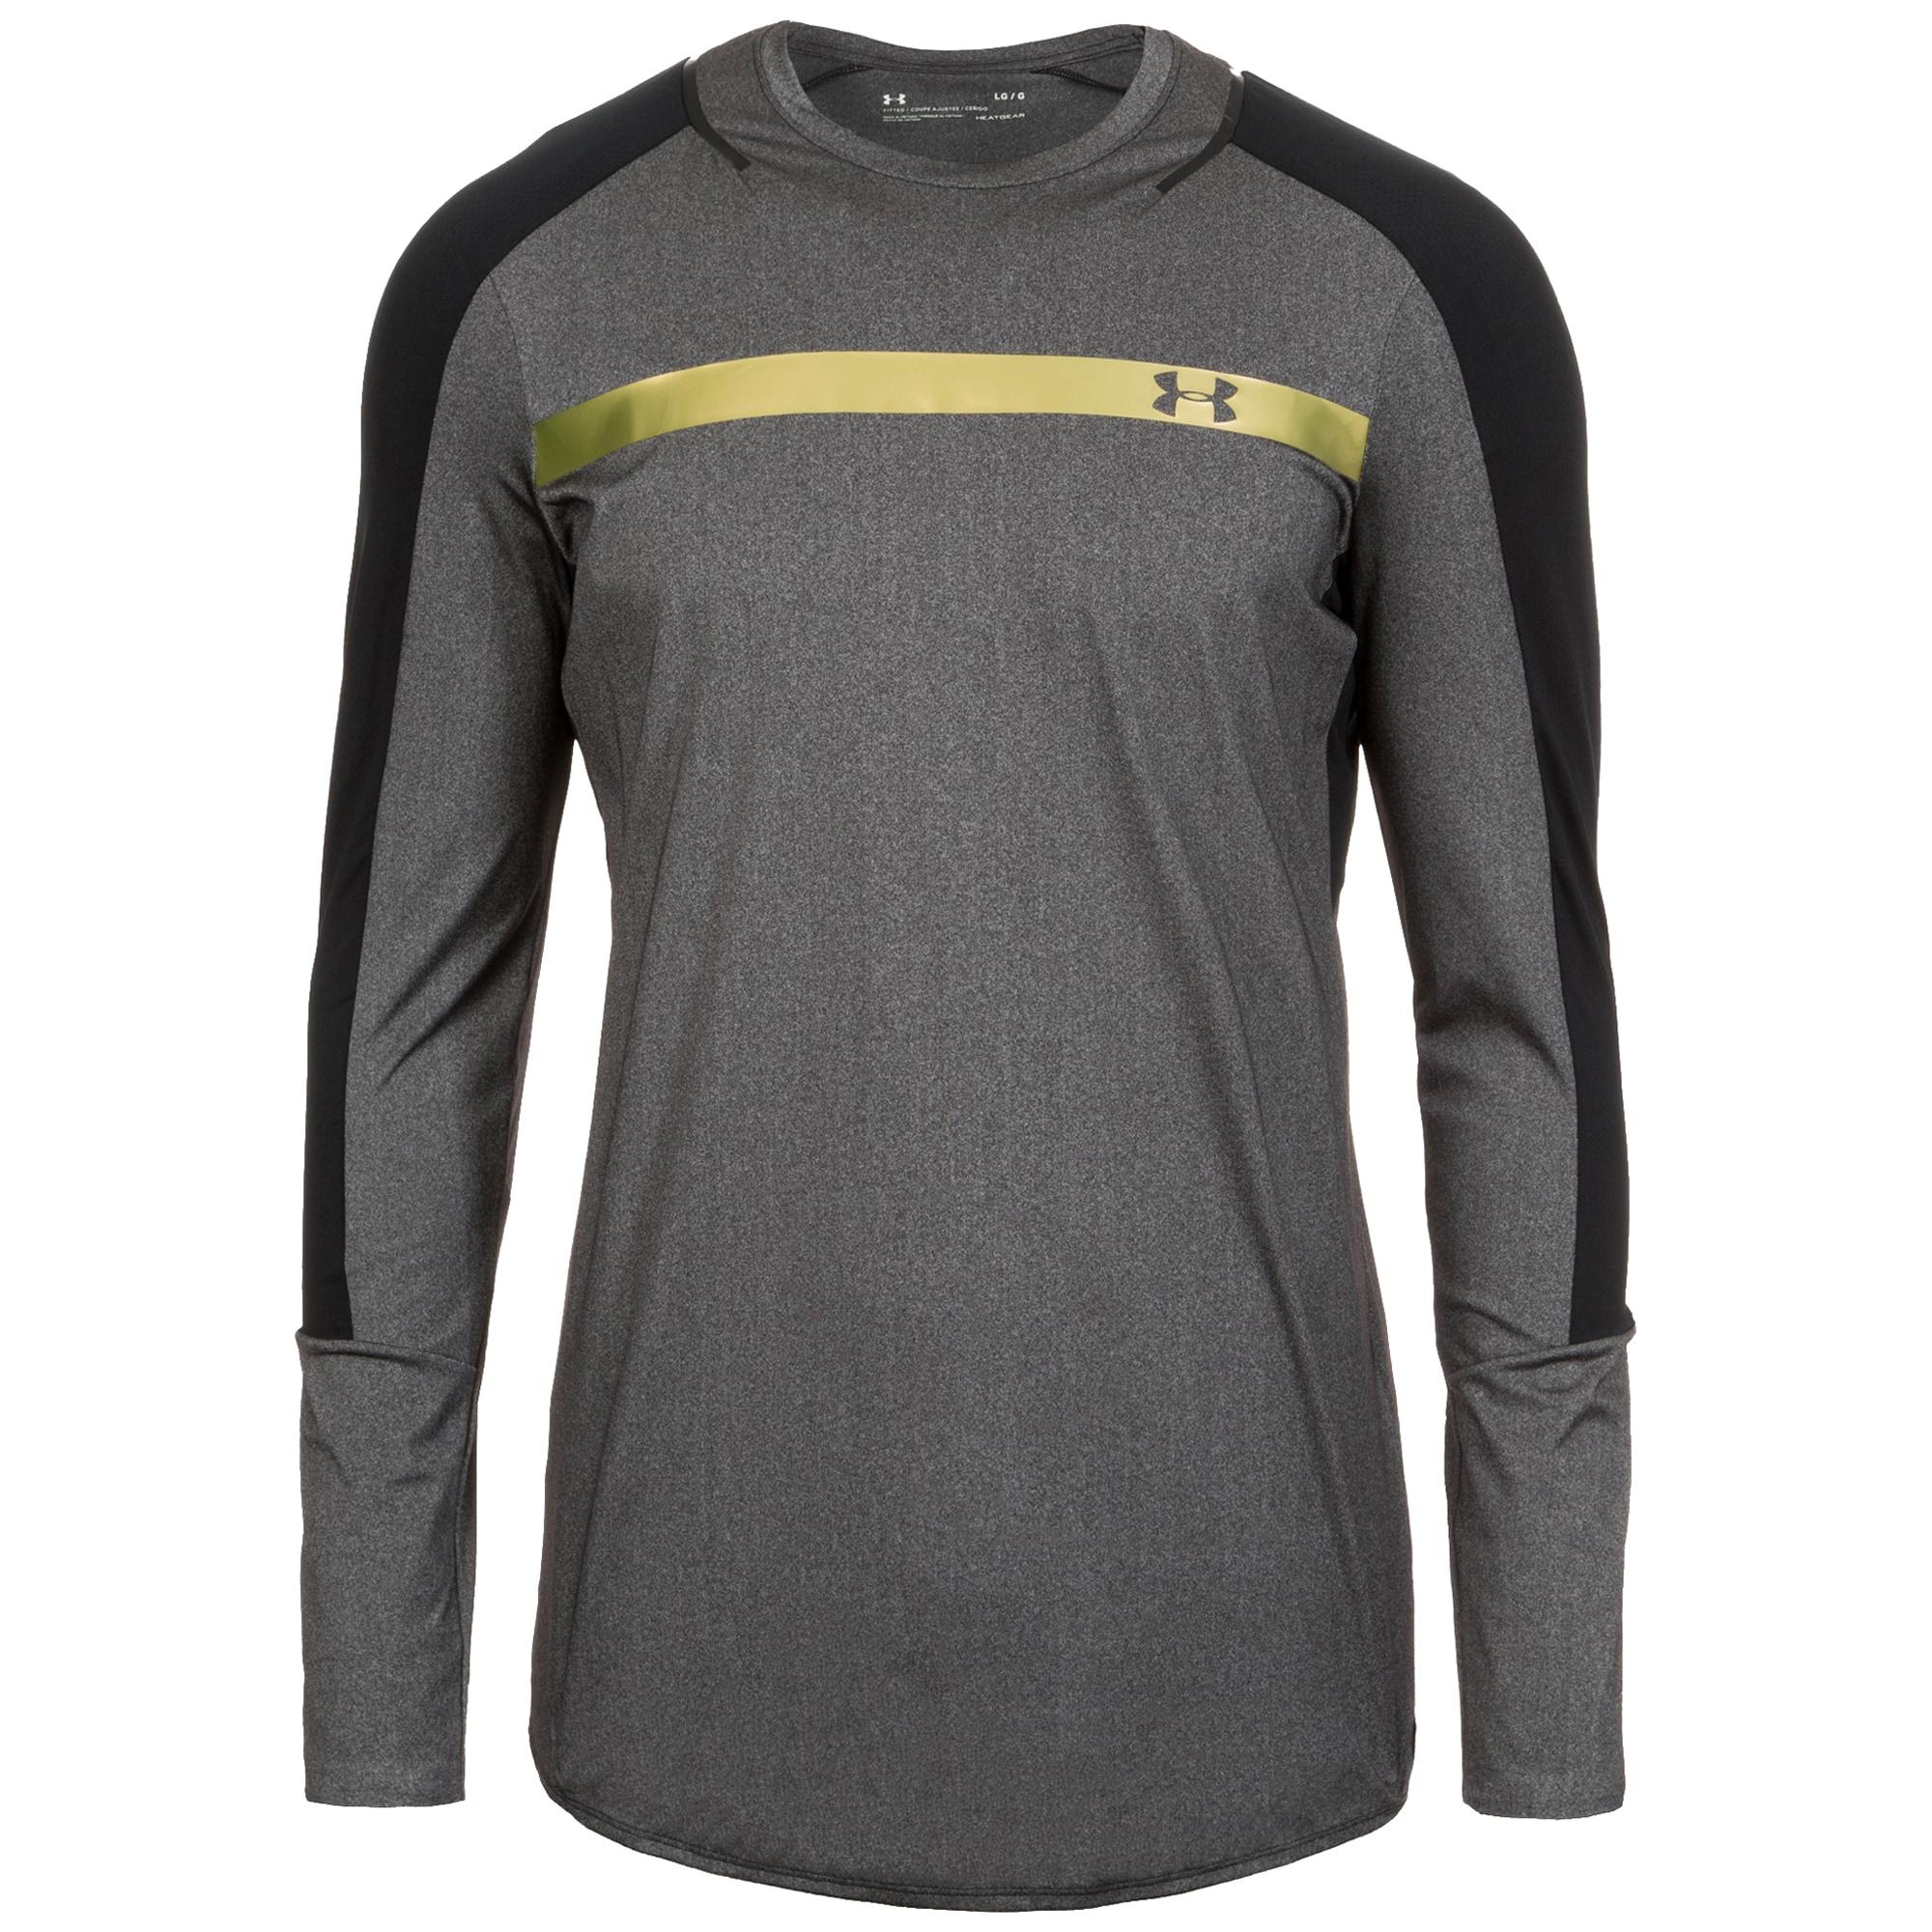 Trainingsshirt 'HeatGear Perpetual' | Sportbekleidung > Sportshirts > Funktionsshirts | Under Armour